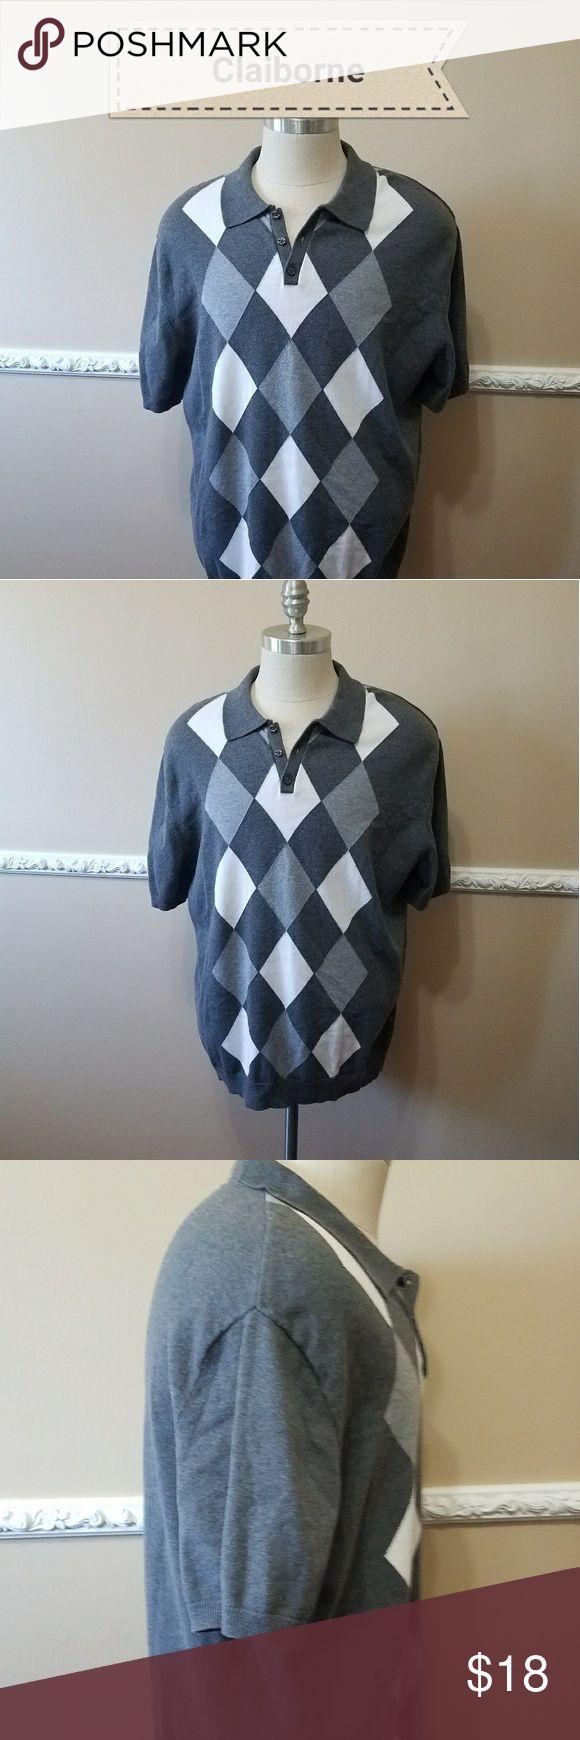 "Men's Claiborne Argyle Pullover XXL Very stylish short sleeve pullover sweater. 100% cotton.  Approx flat lay measurements  Chest      24""    (Armpit - Armpit) Length    30.5"" Claiborne Shirts Polos"